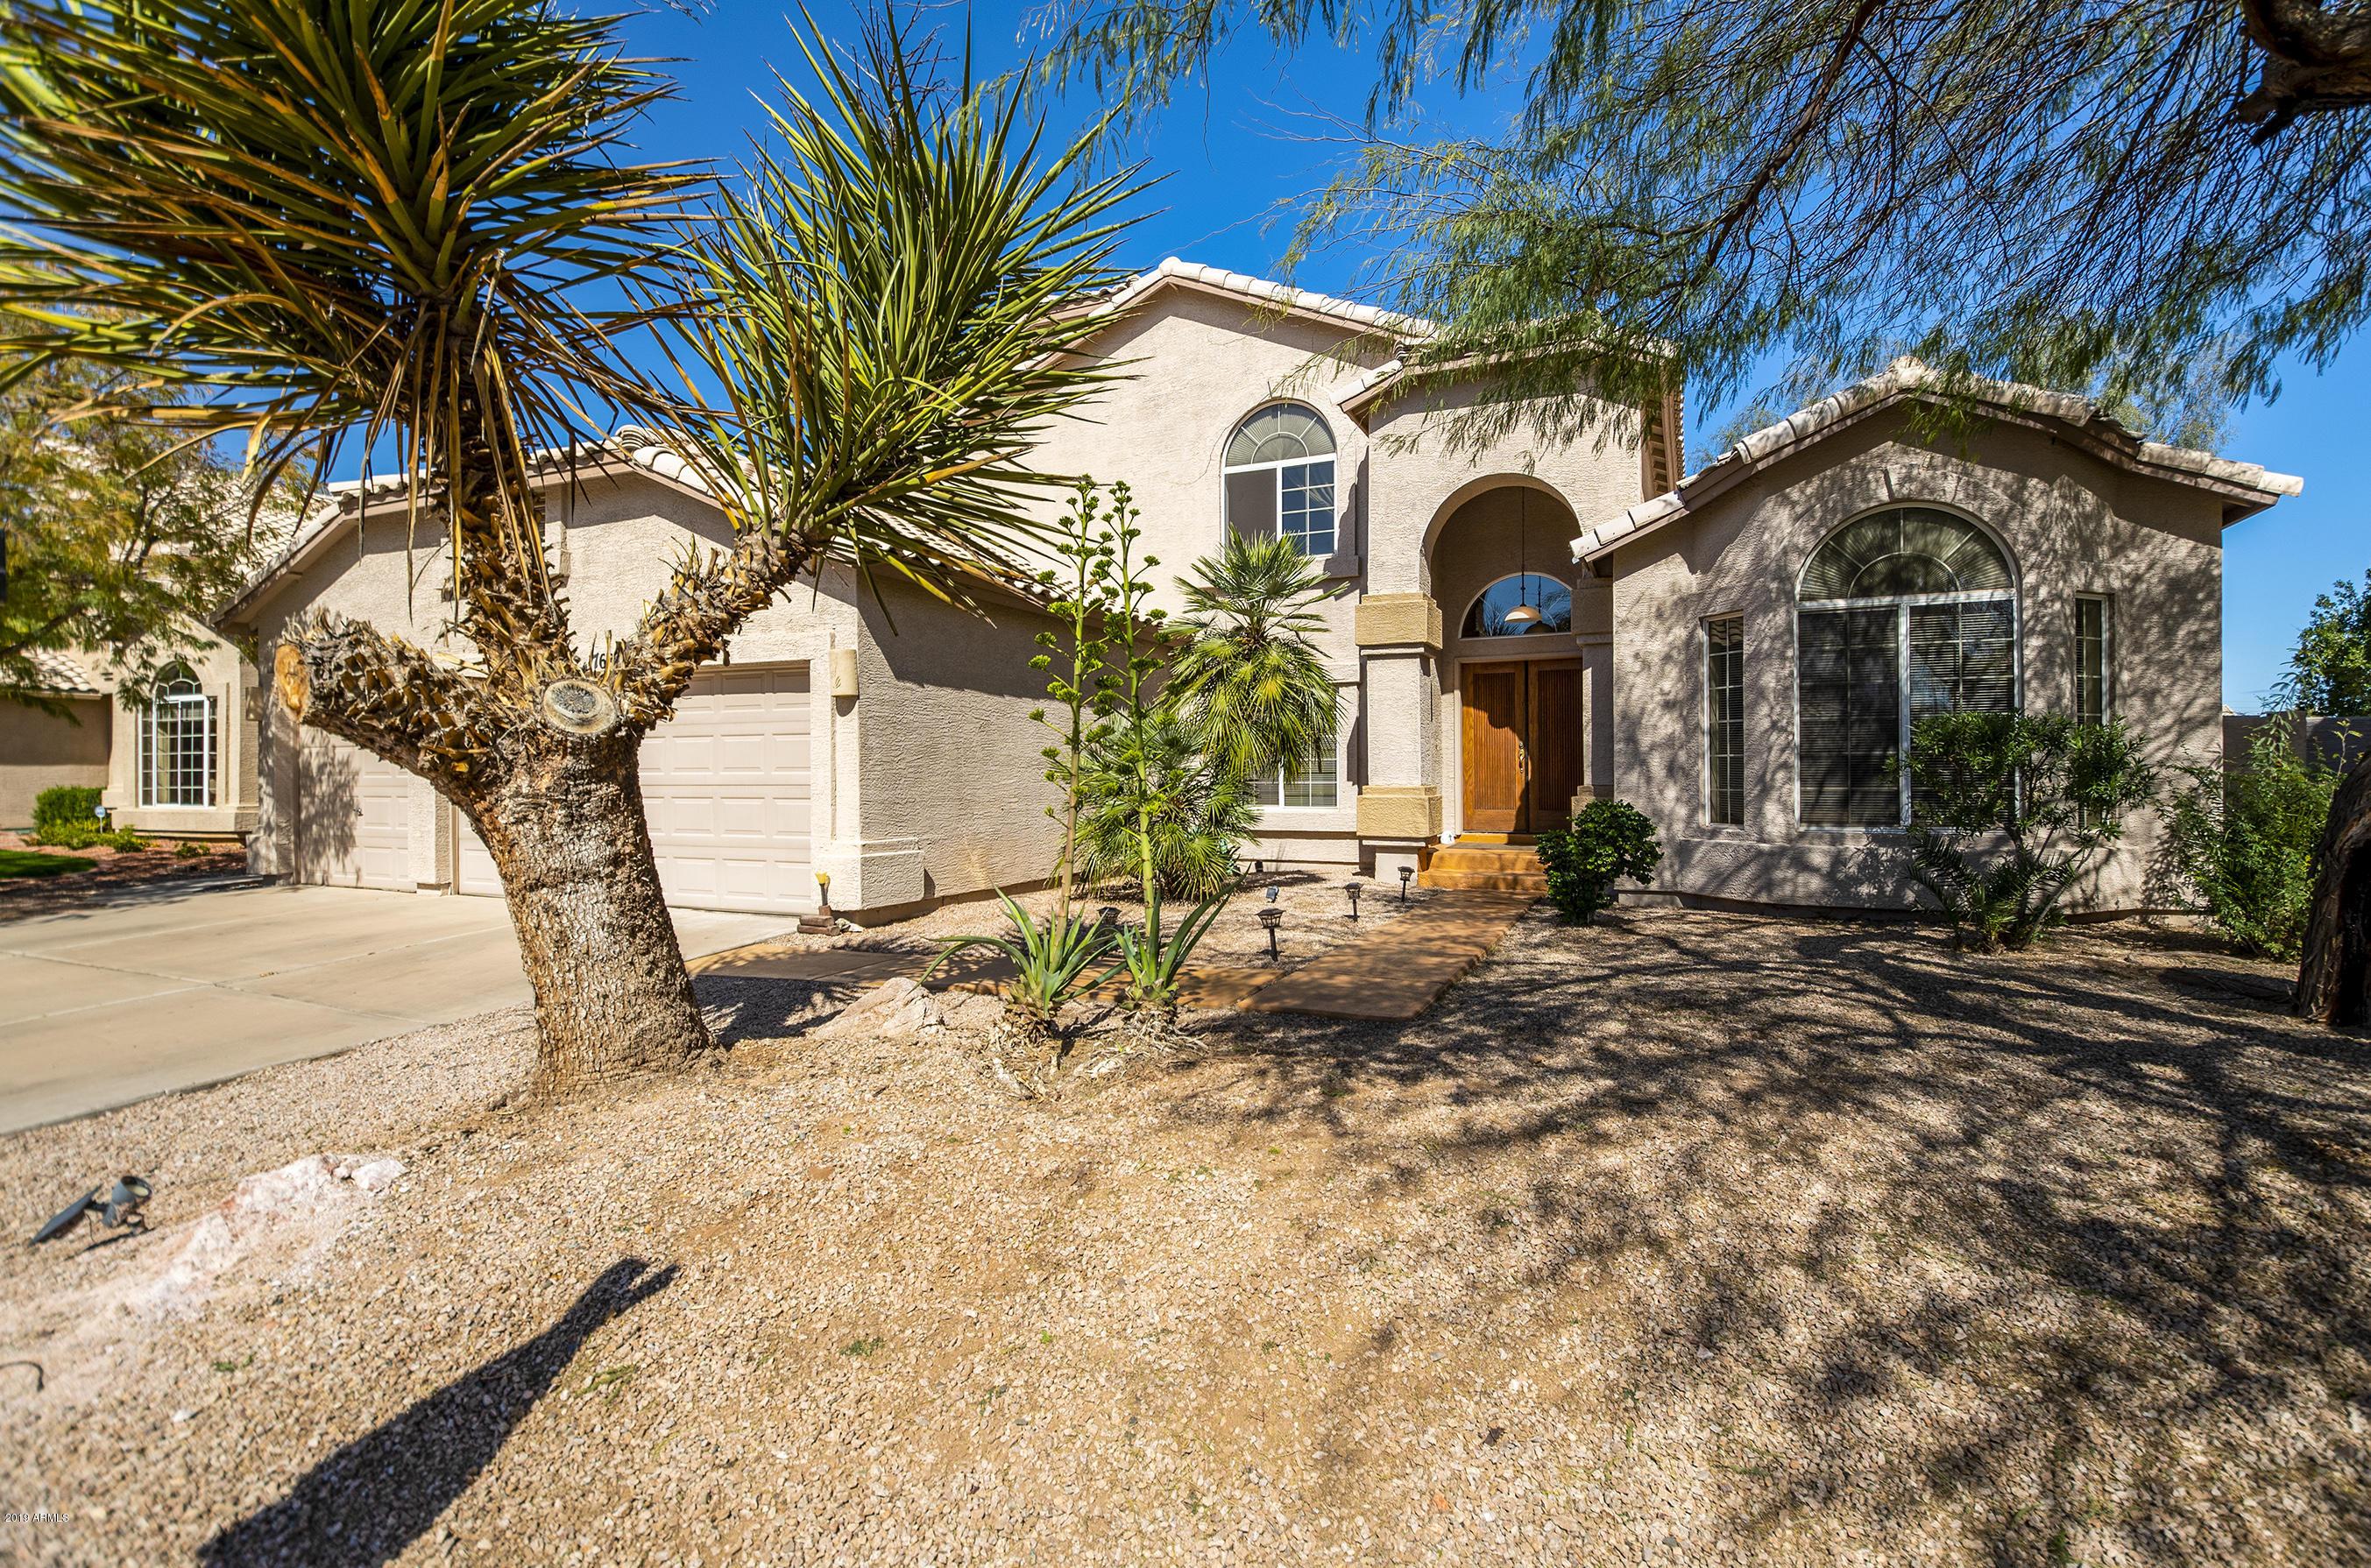 MLS 5896041 1768 W Redfield Road, Gilbert, AZ 85233 Gilbert AZ El Dorado Lakes